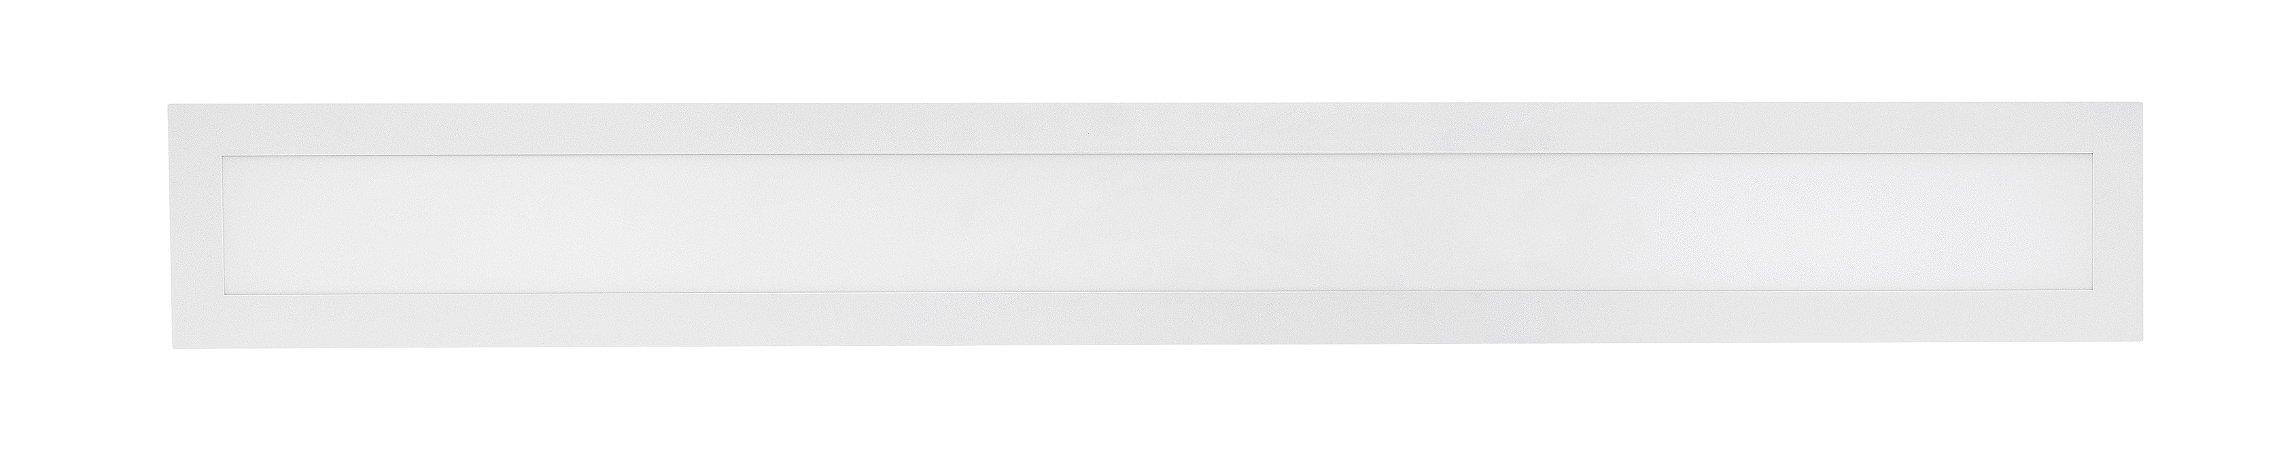 Painel Slim Embutir Retangular 40w 4000k Biv REF: STH9956/40